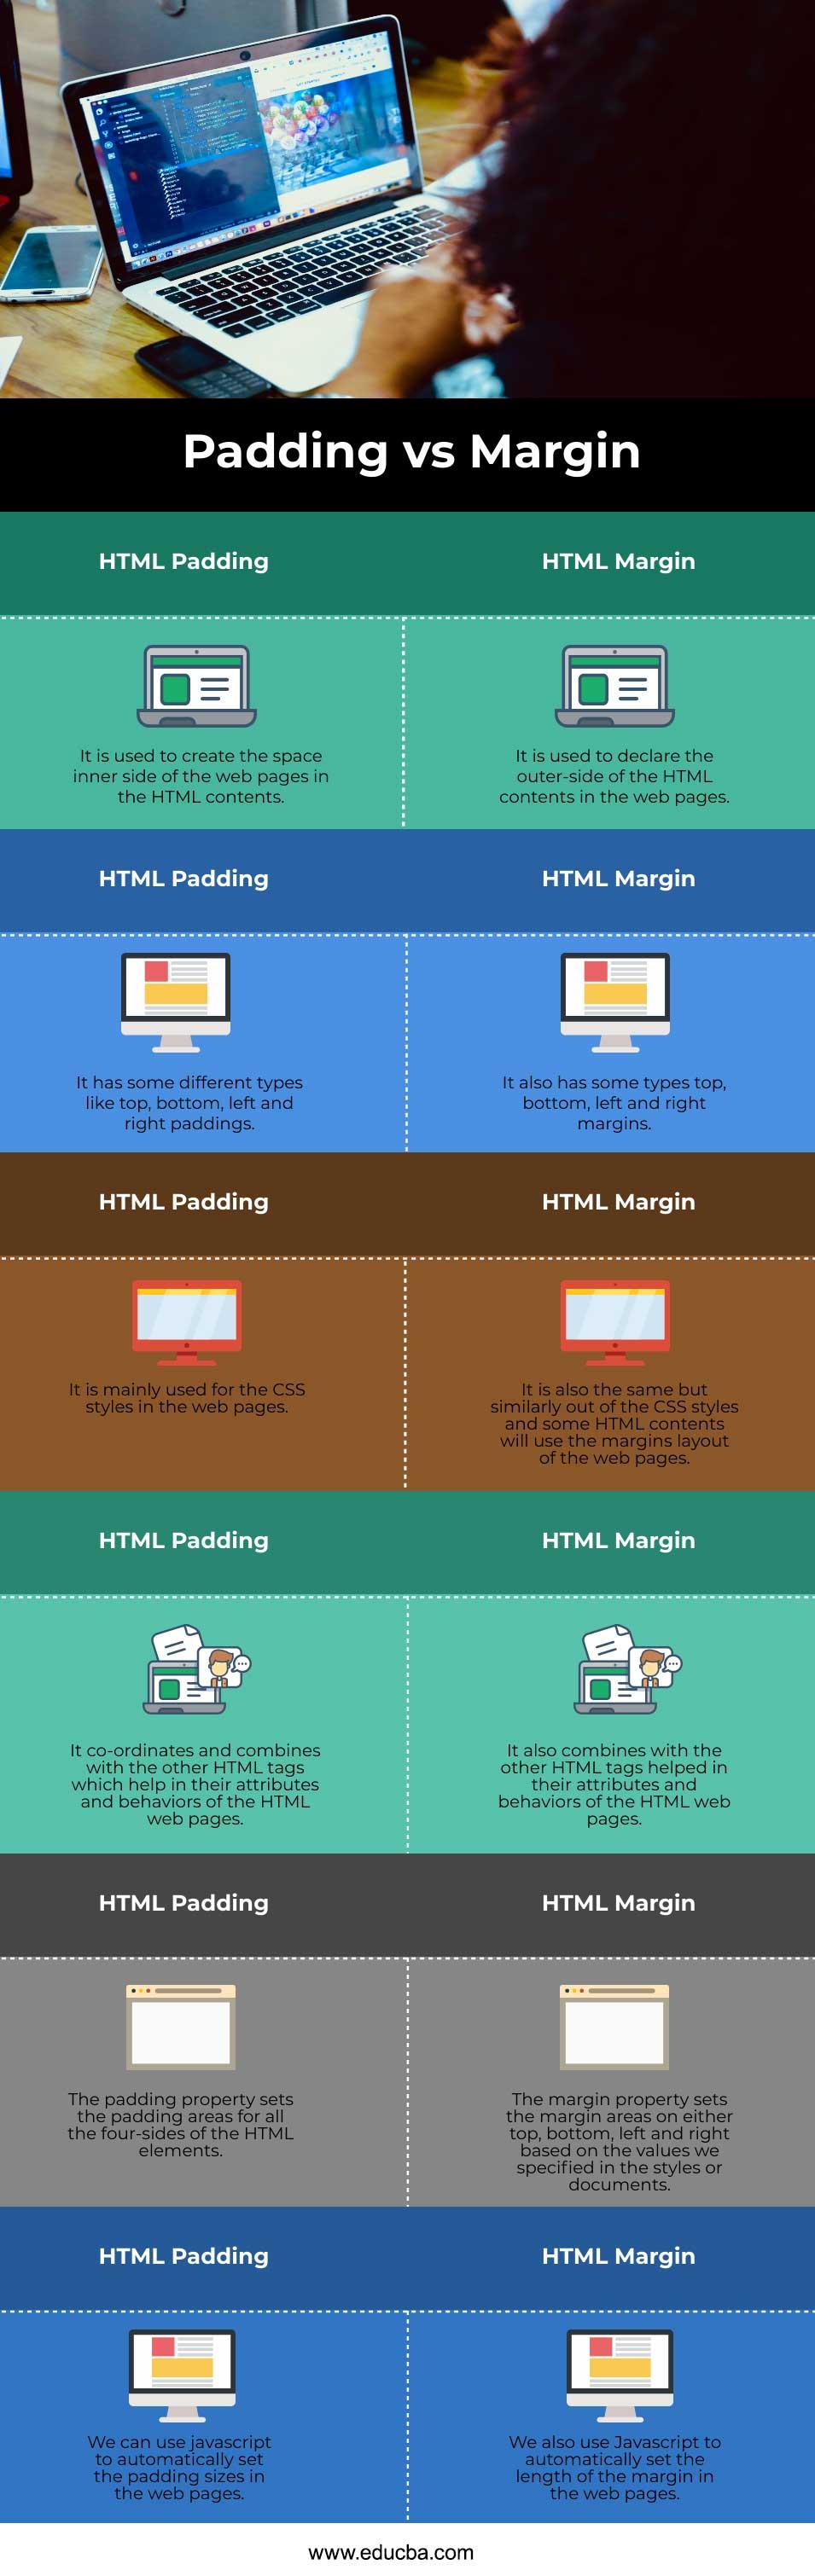 HTML Padding vs Margin info